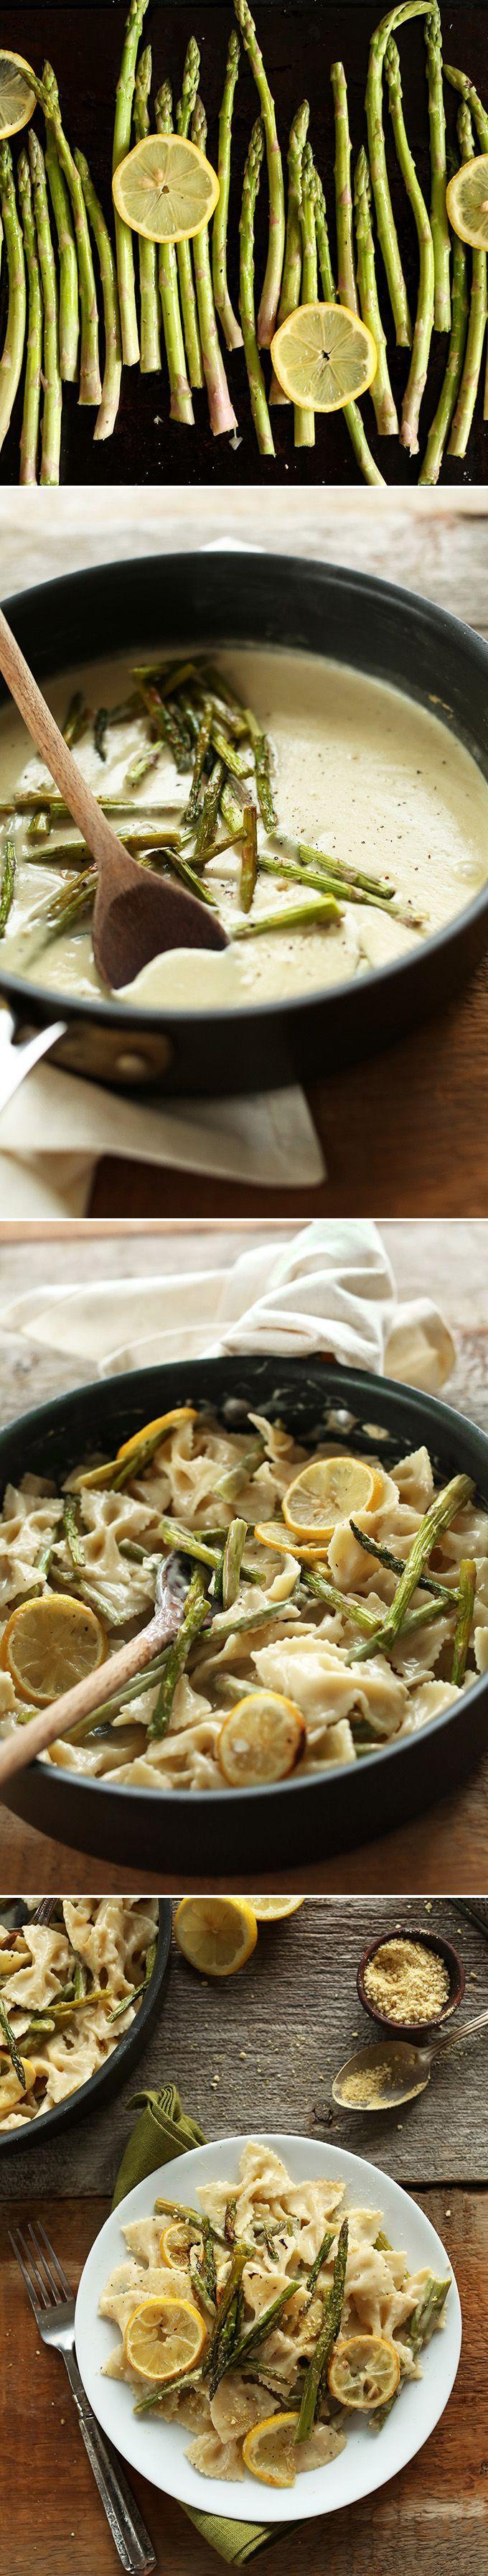 Vegan Lemon Asparagus Pasta | Minimalist Baker Recipes